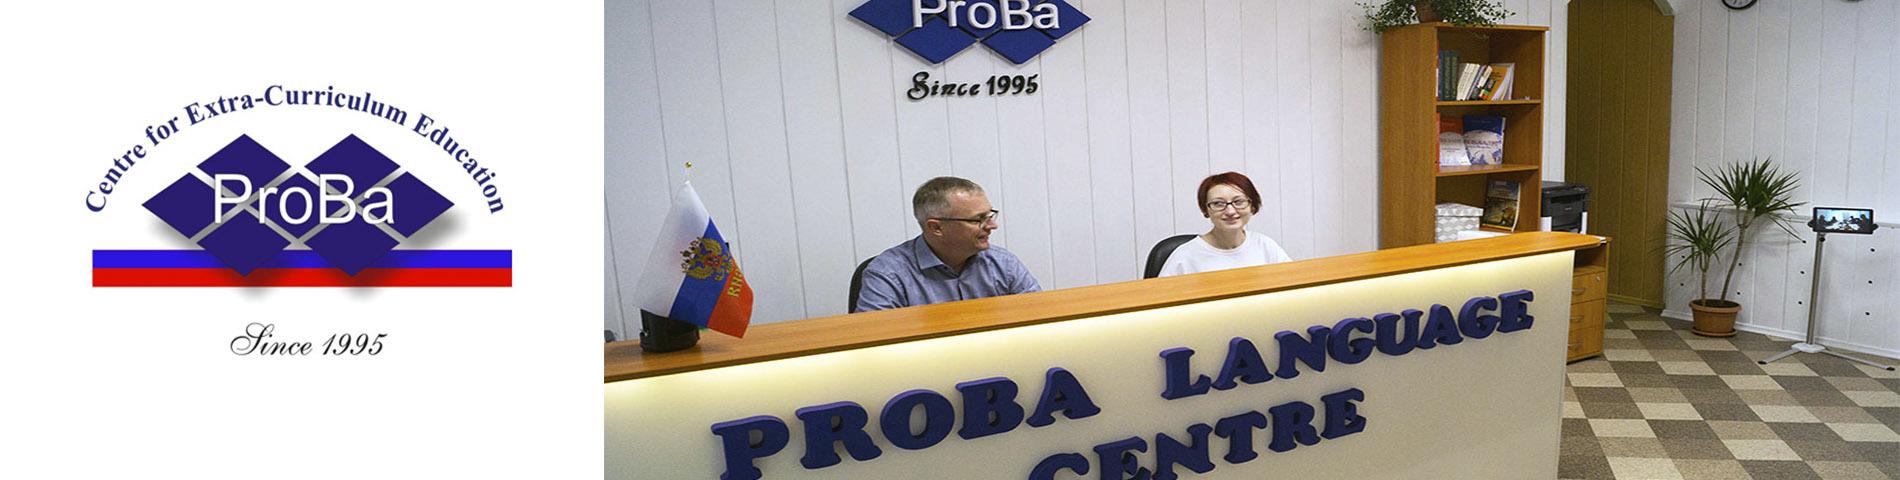 ProBa Educational Centre picture 1